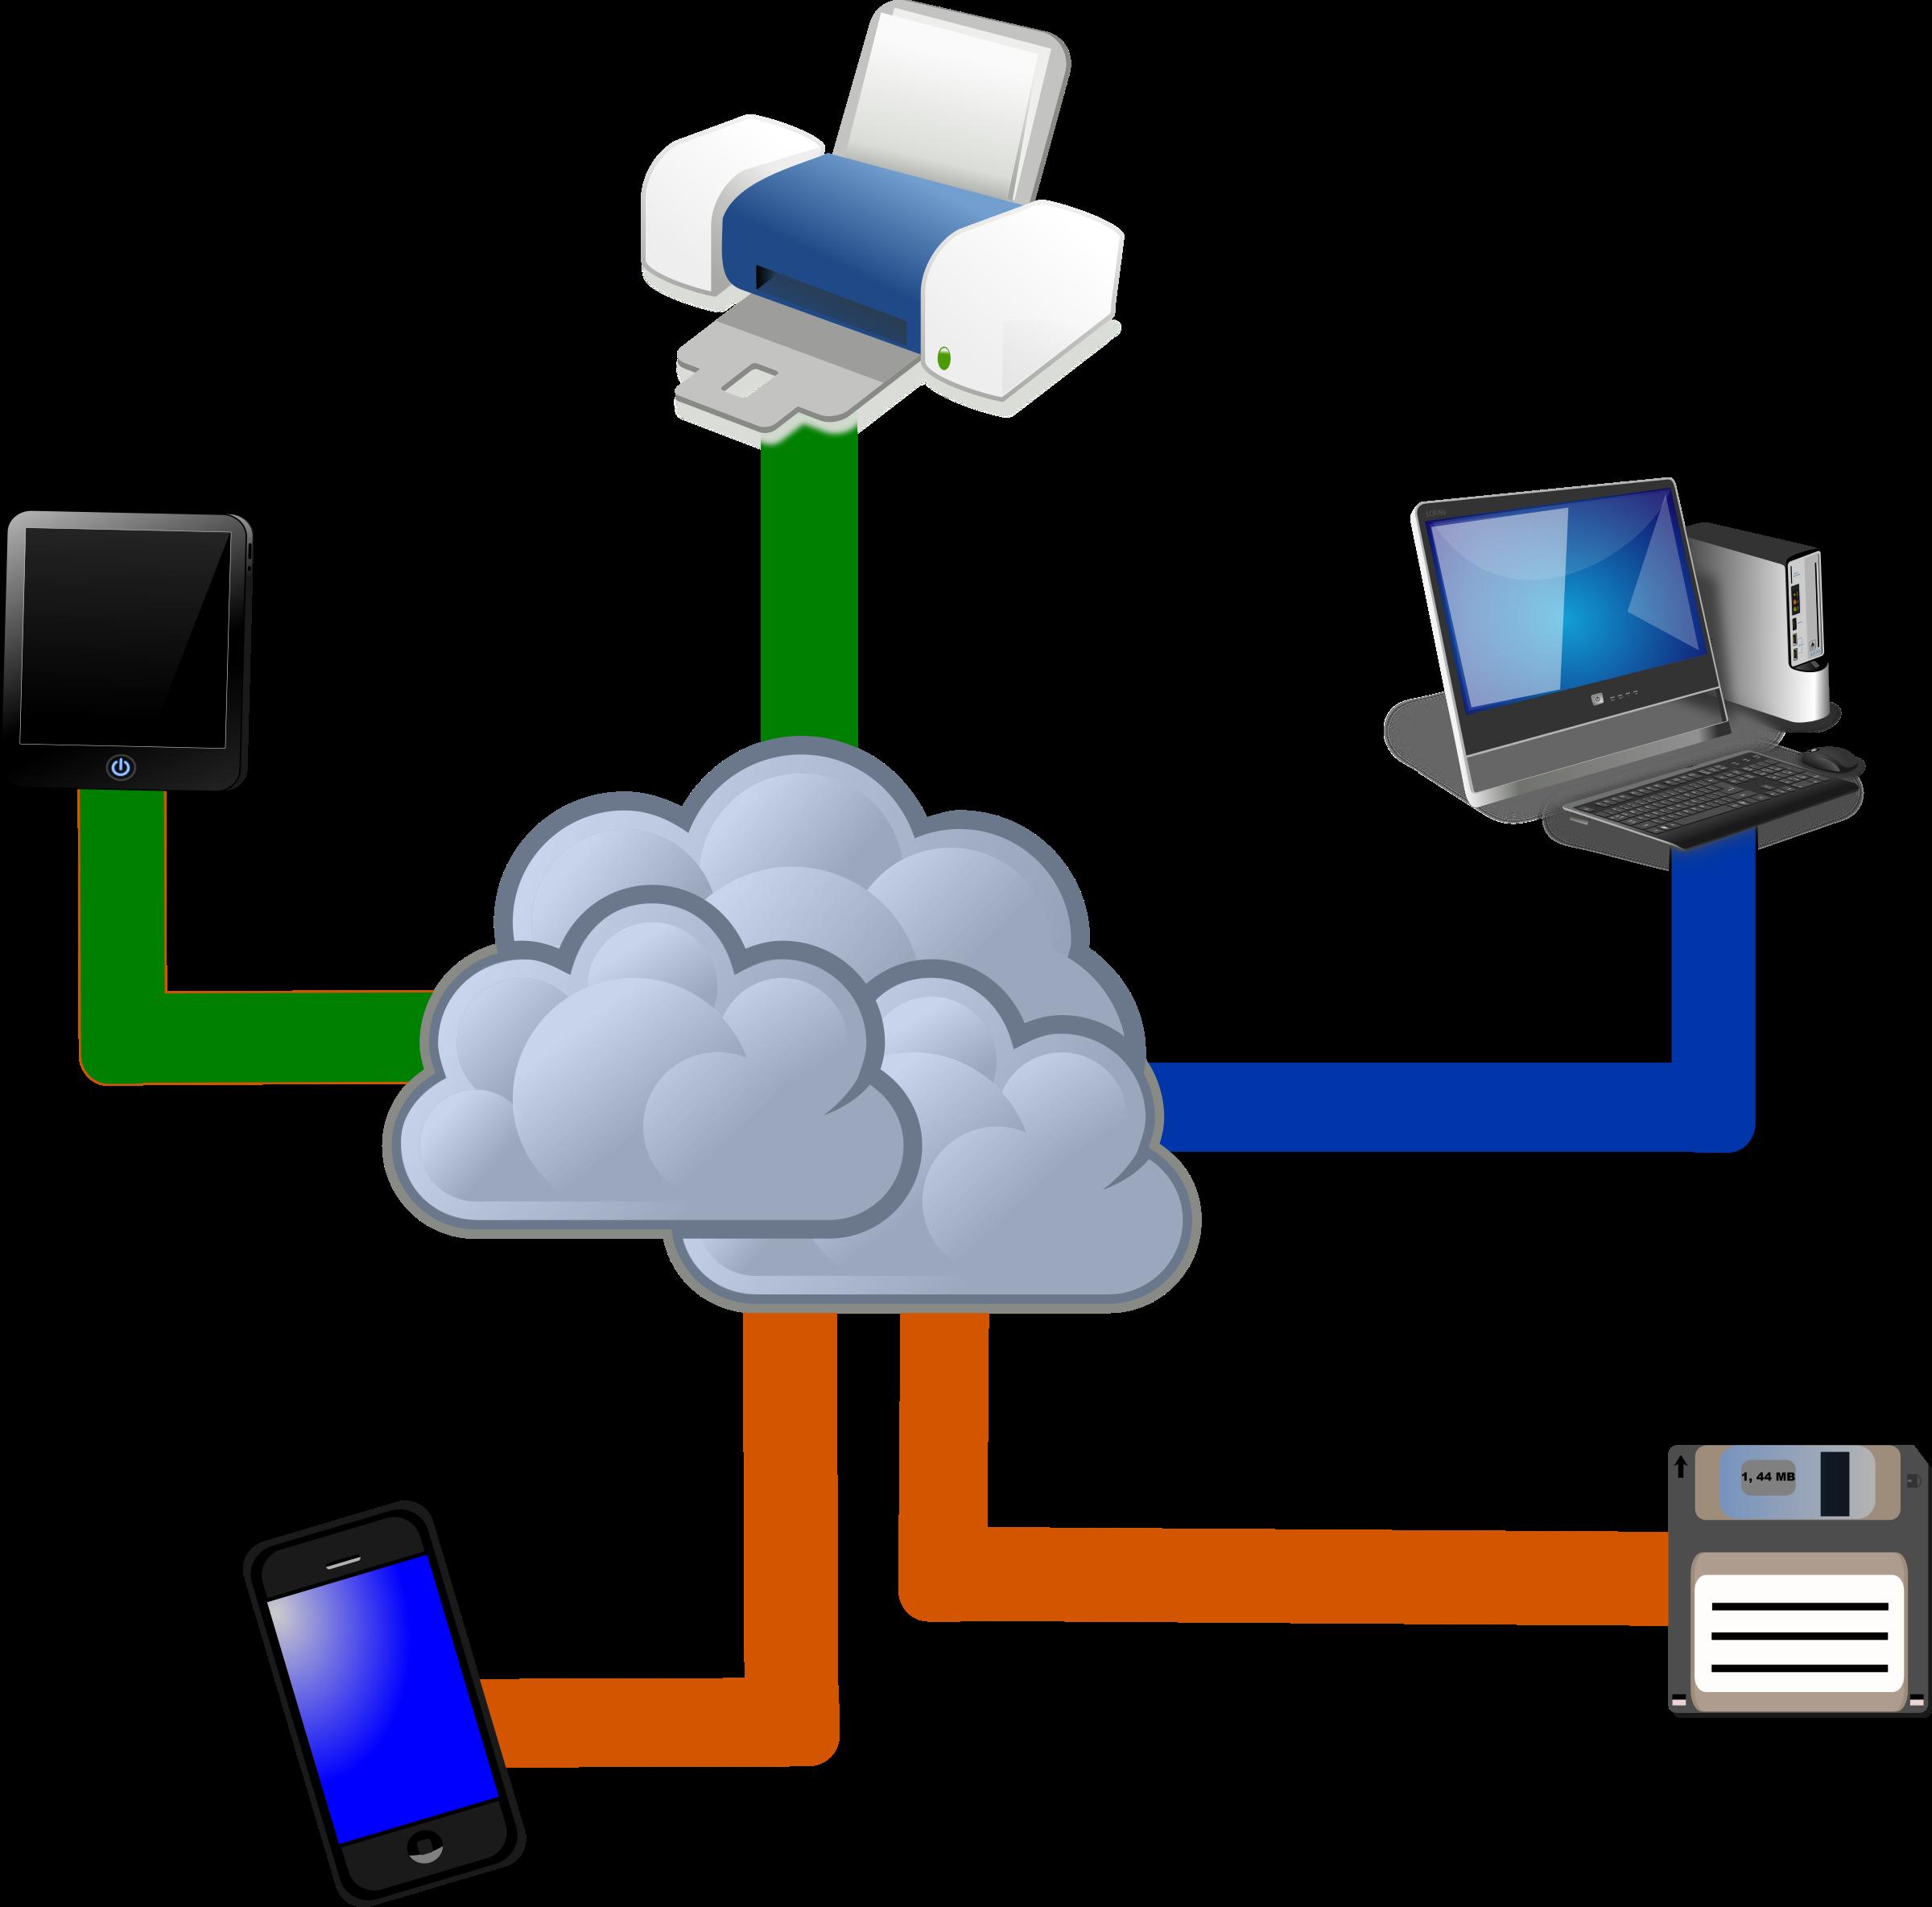 Cloud big image png. Clipart computer computing